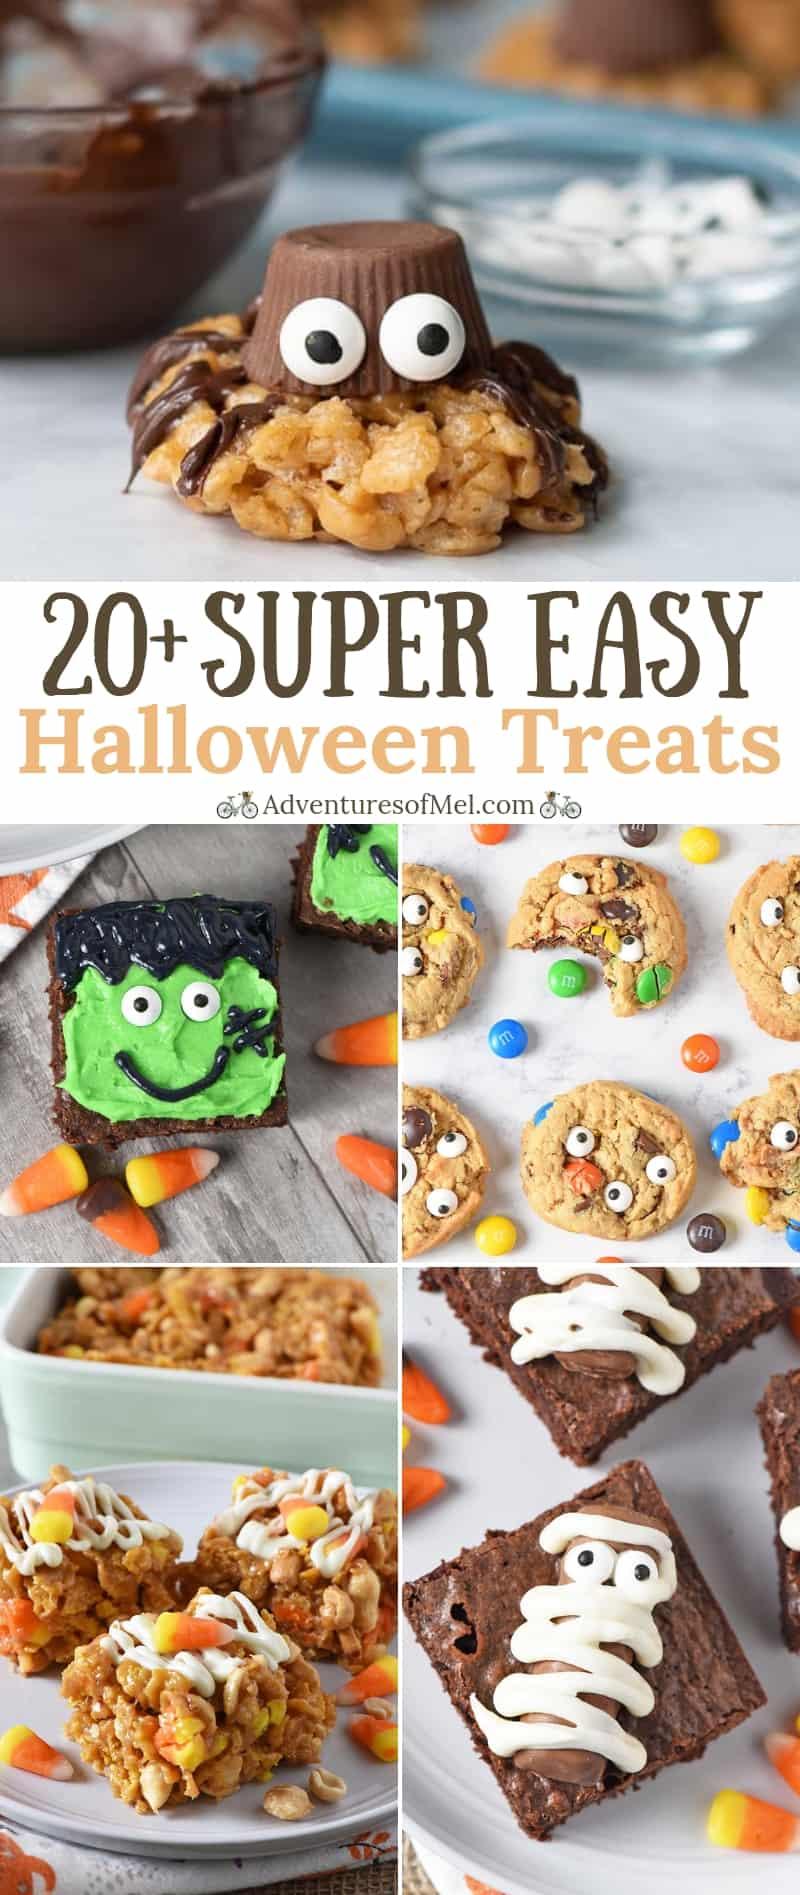 super easy halloween treats recipes anyone can make